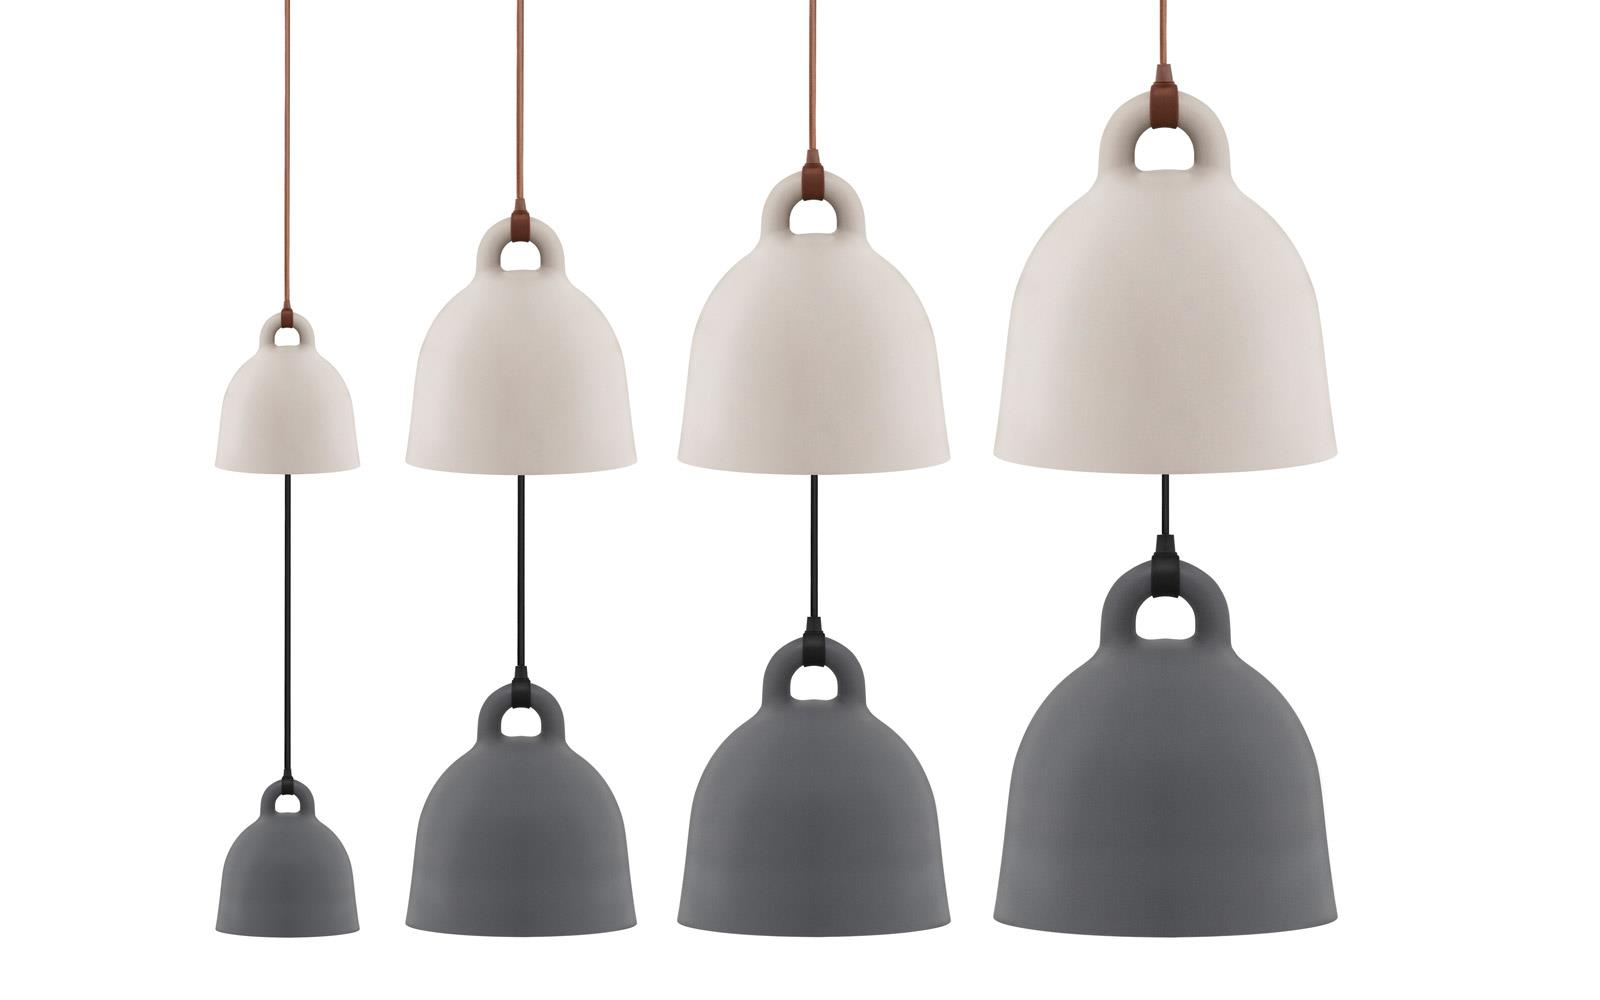 Bell hanglamp Sand-6